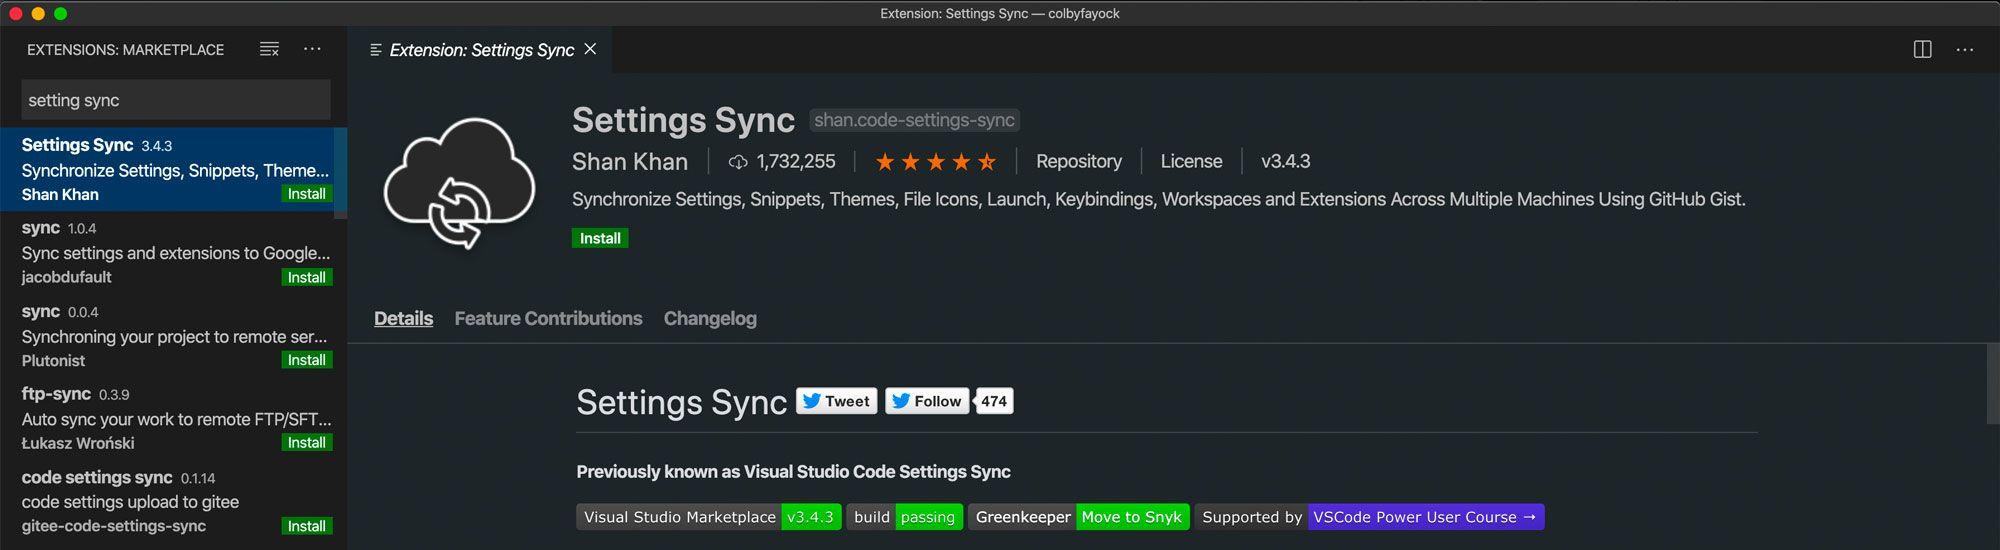 Settings Sync